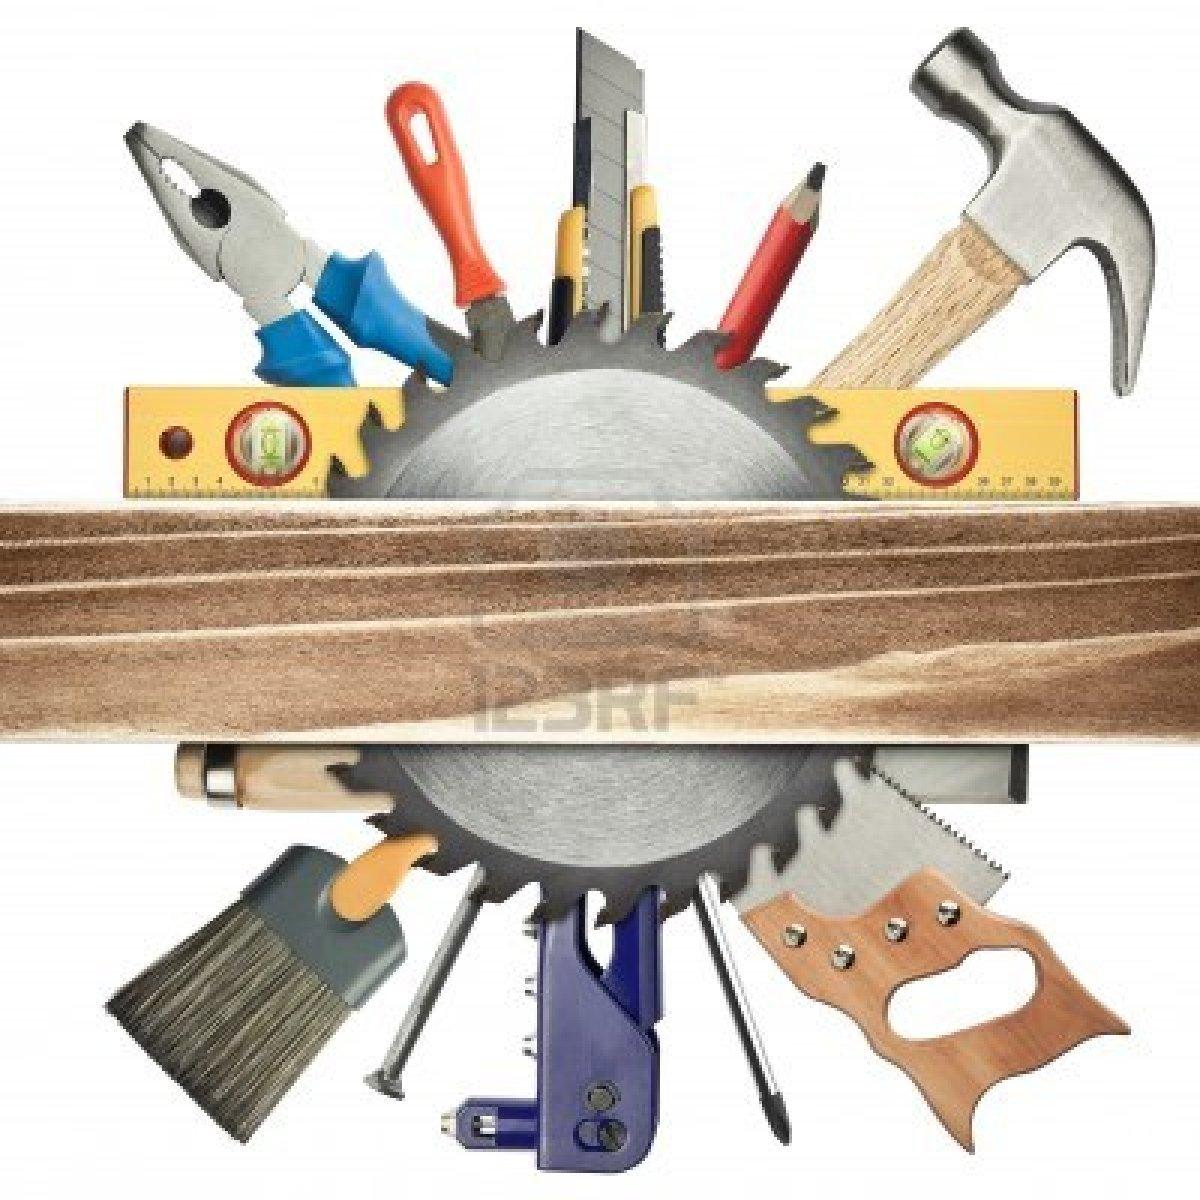 Herramientas carpinter a - Materiales de carpinteria ...